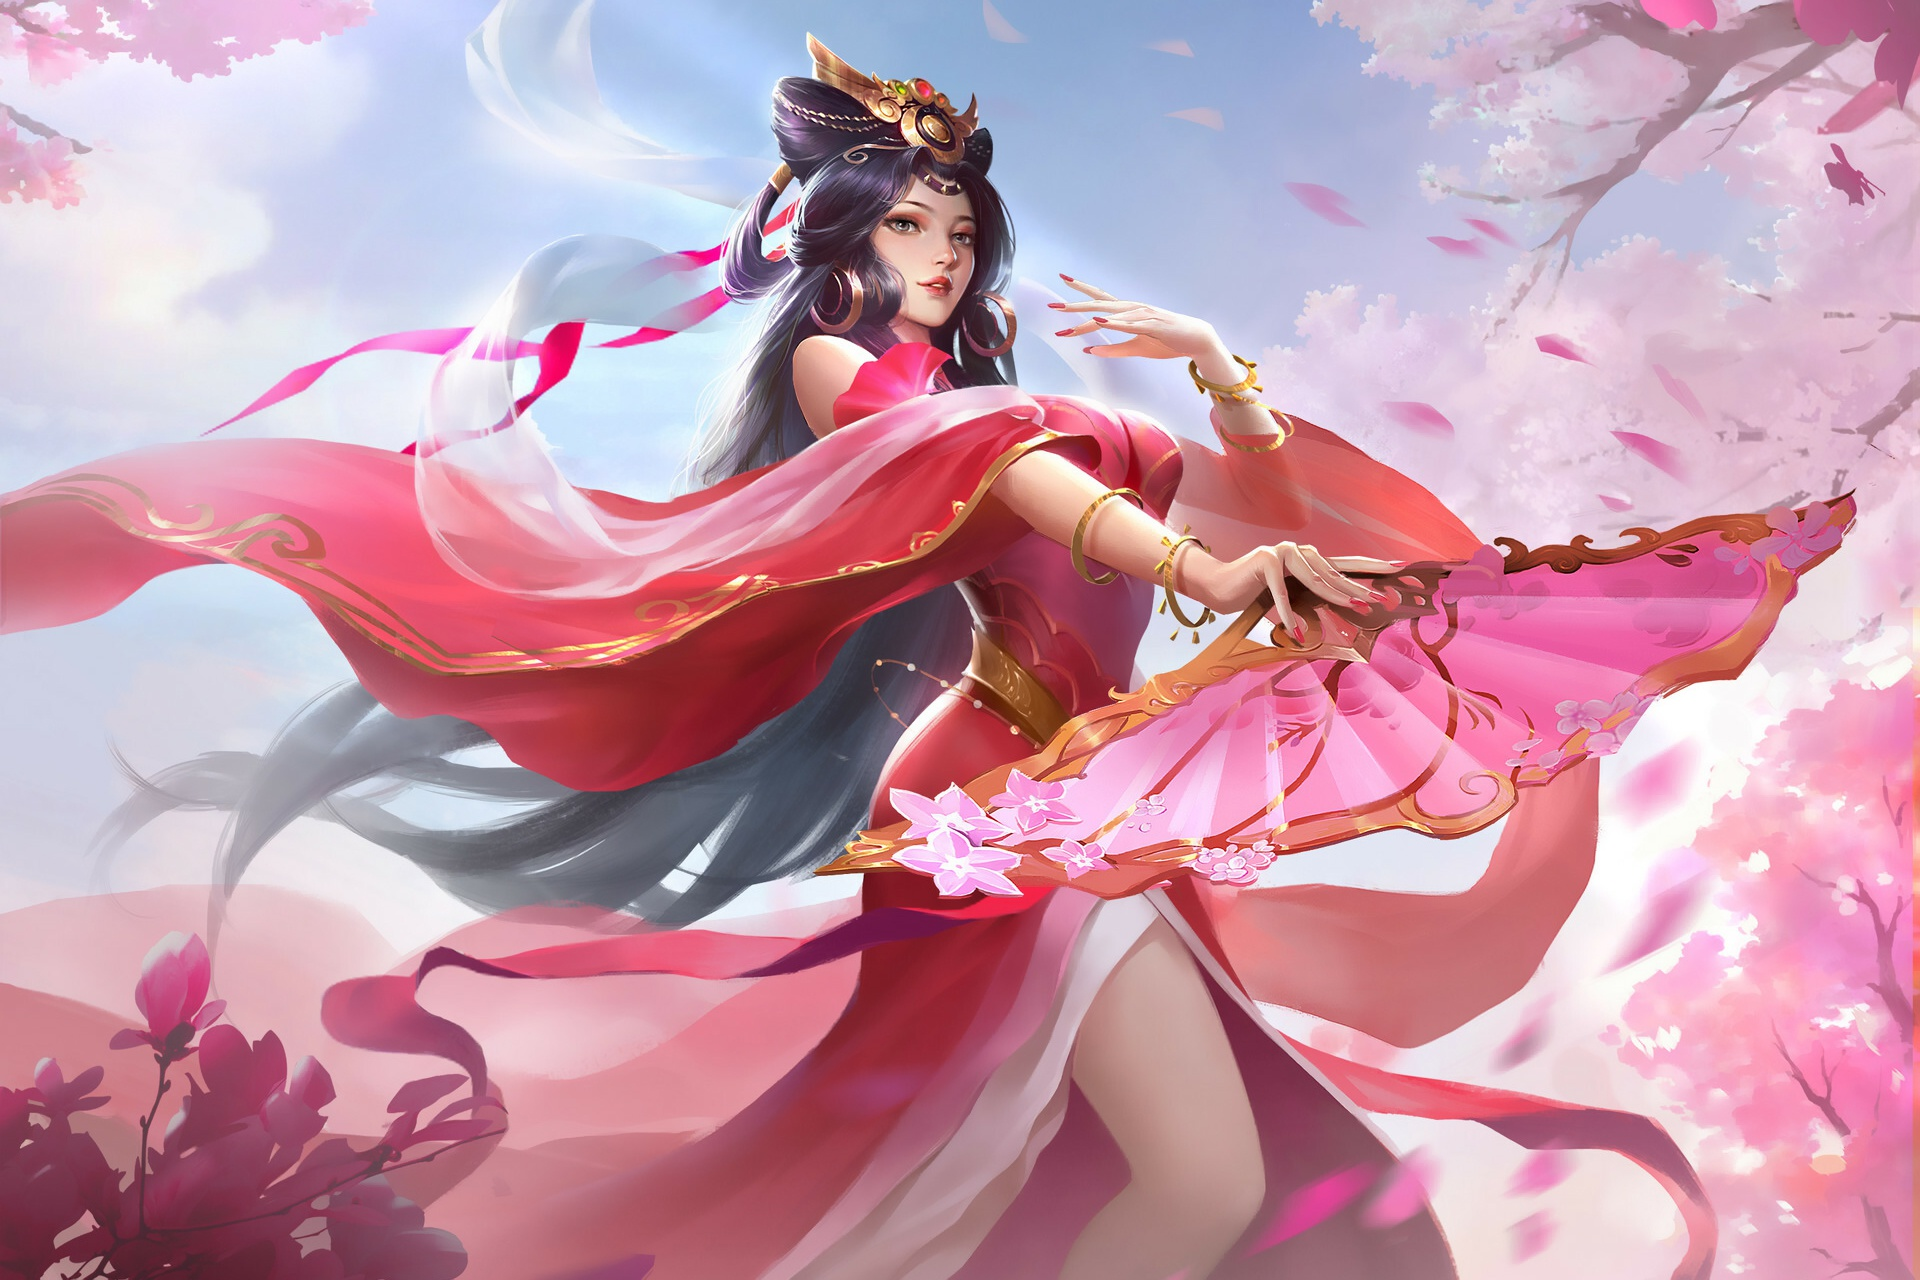 Anime Girl In Chinese Pink Dress Dancing, HD Anime, 4k ...